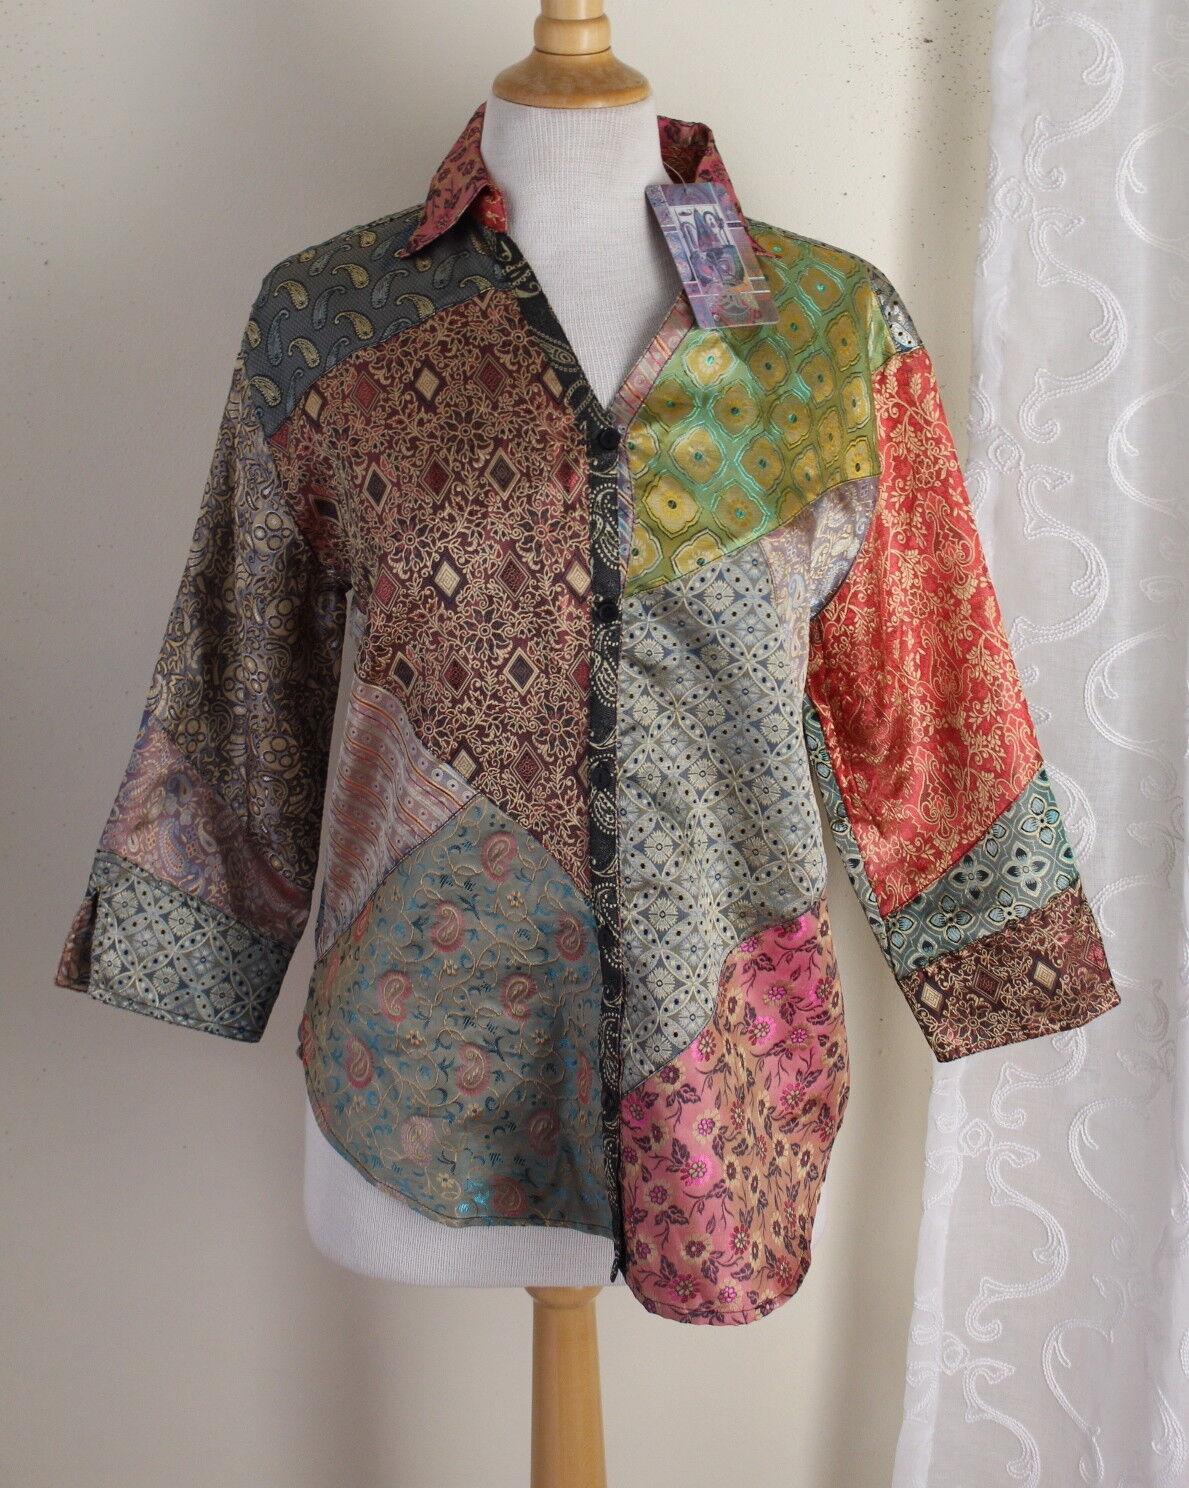 NWT Sacrot Threads Sz S Art-to-Wear Fun Boho Gypsy Paisley Patchwork Tunic Top